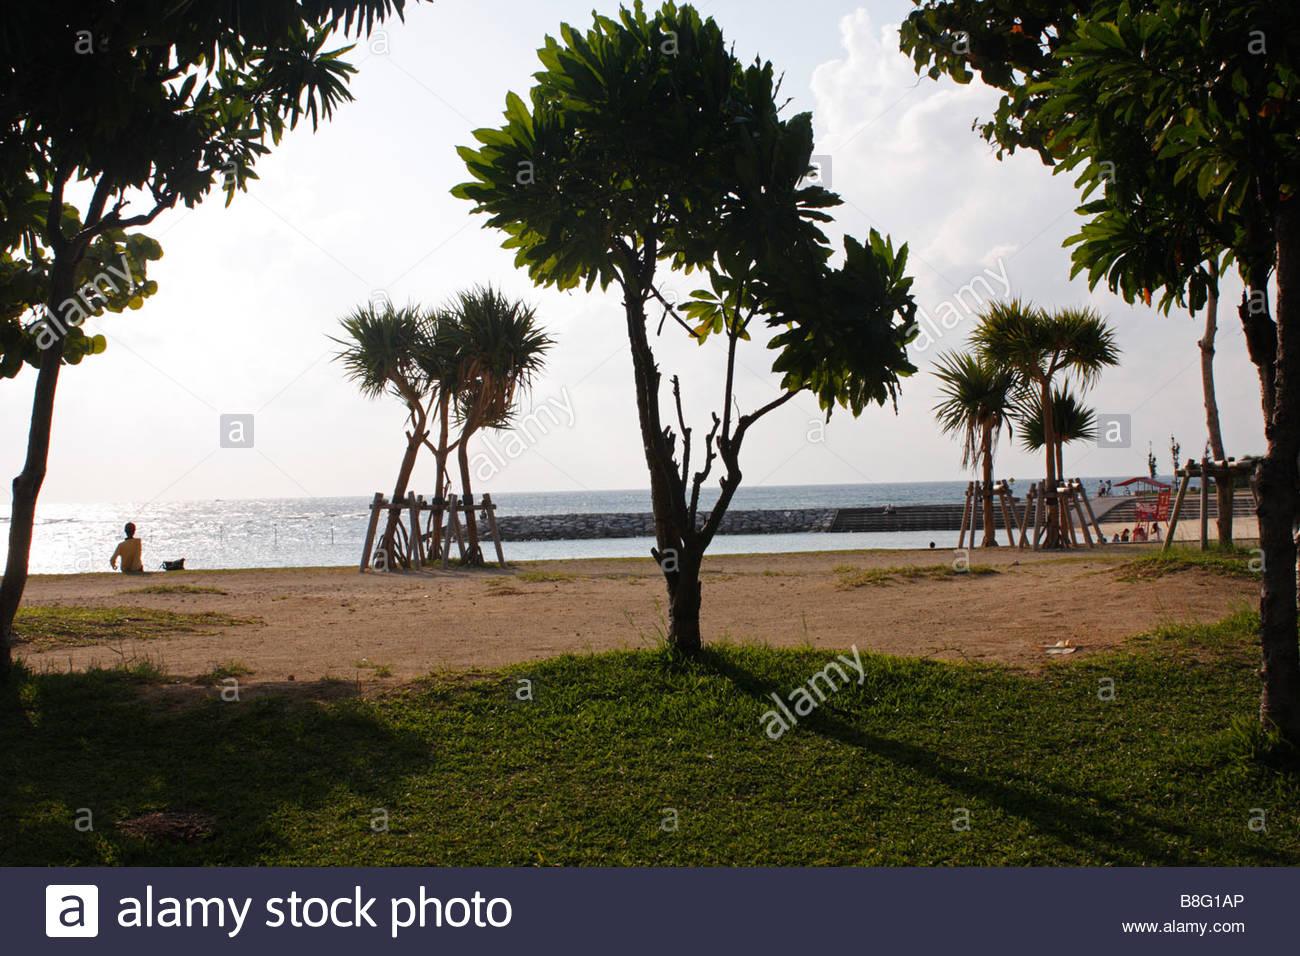 Sunset Beach, Okinawa, Japan - Stock Image